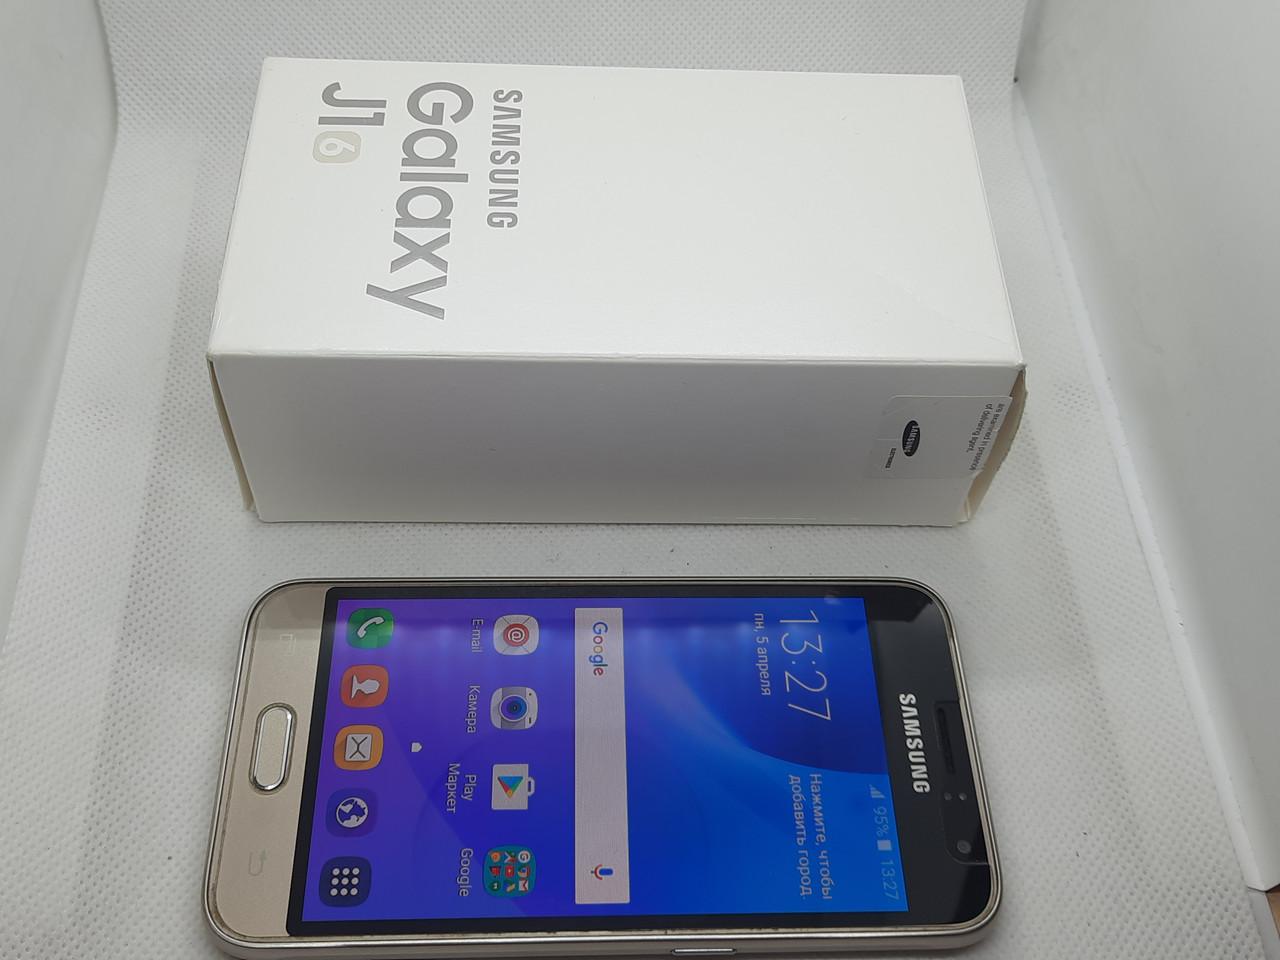 Samsung Galaxy J1 2016 SM-моделі j120 #1504ВР